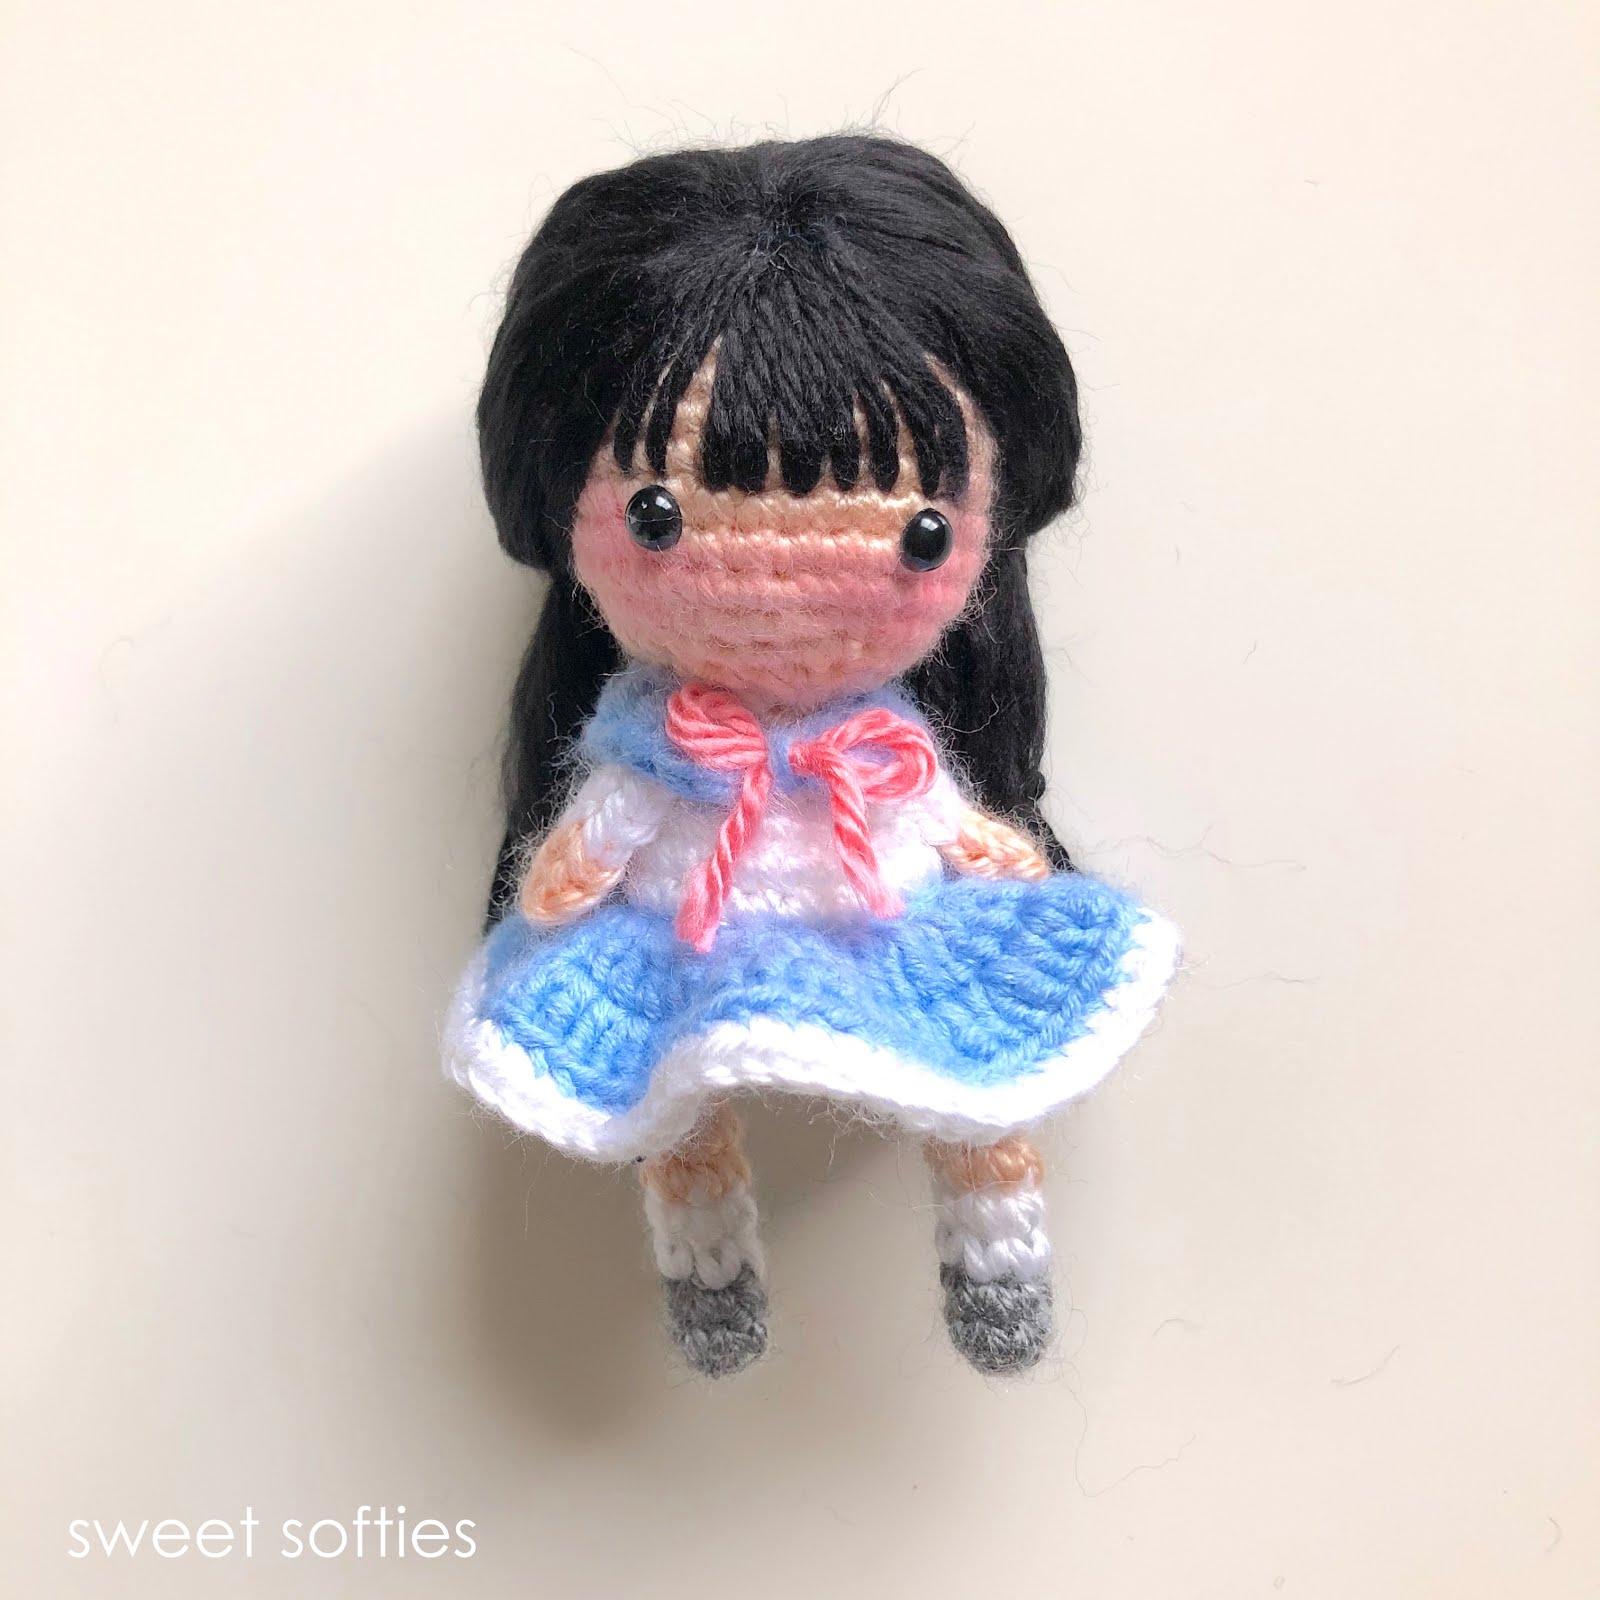 6 Chibi Doll Base Amigurumi Crochet Pattern for Custom | Etsy | 1600x1600